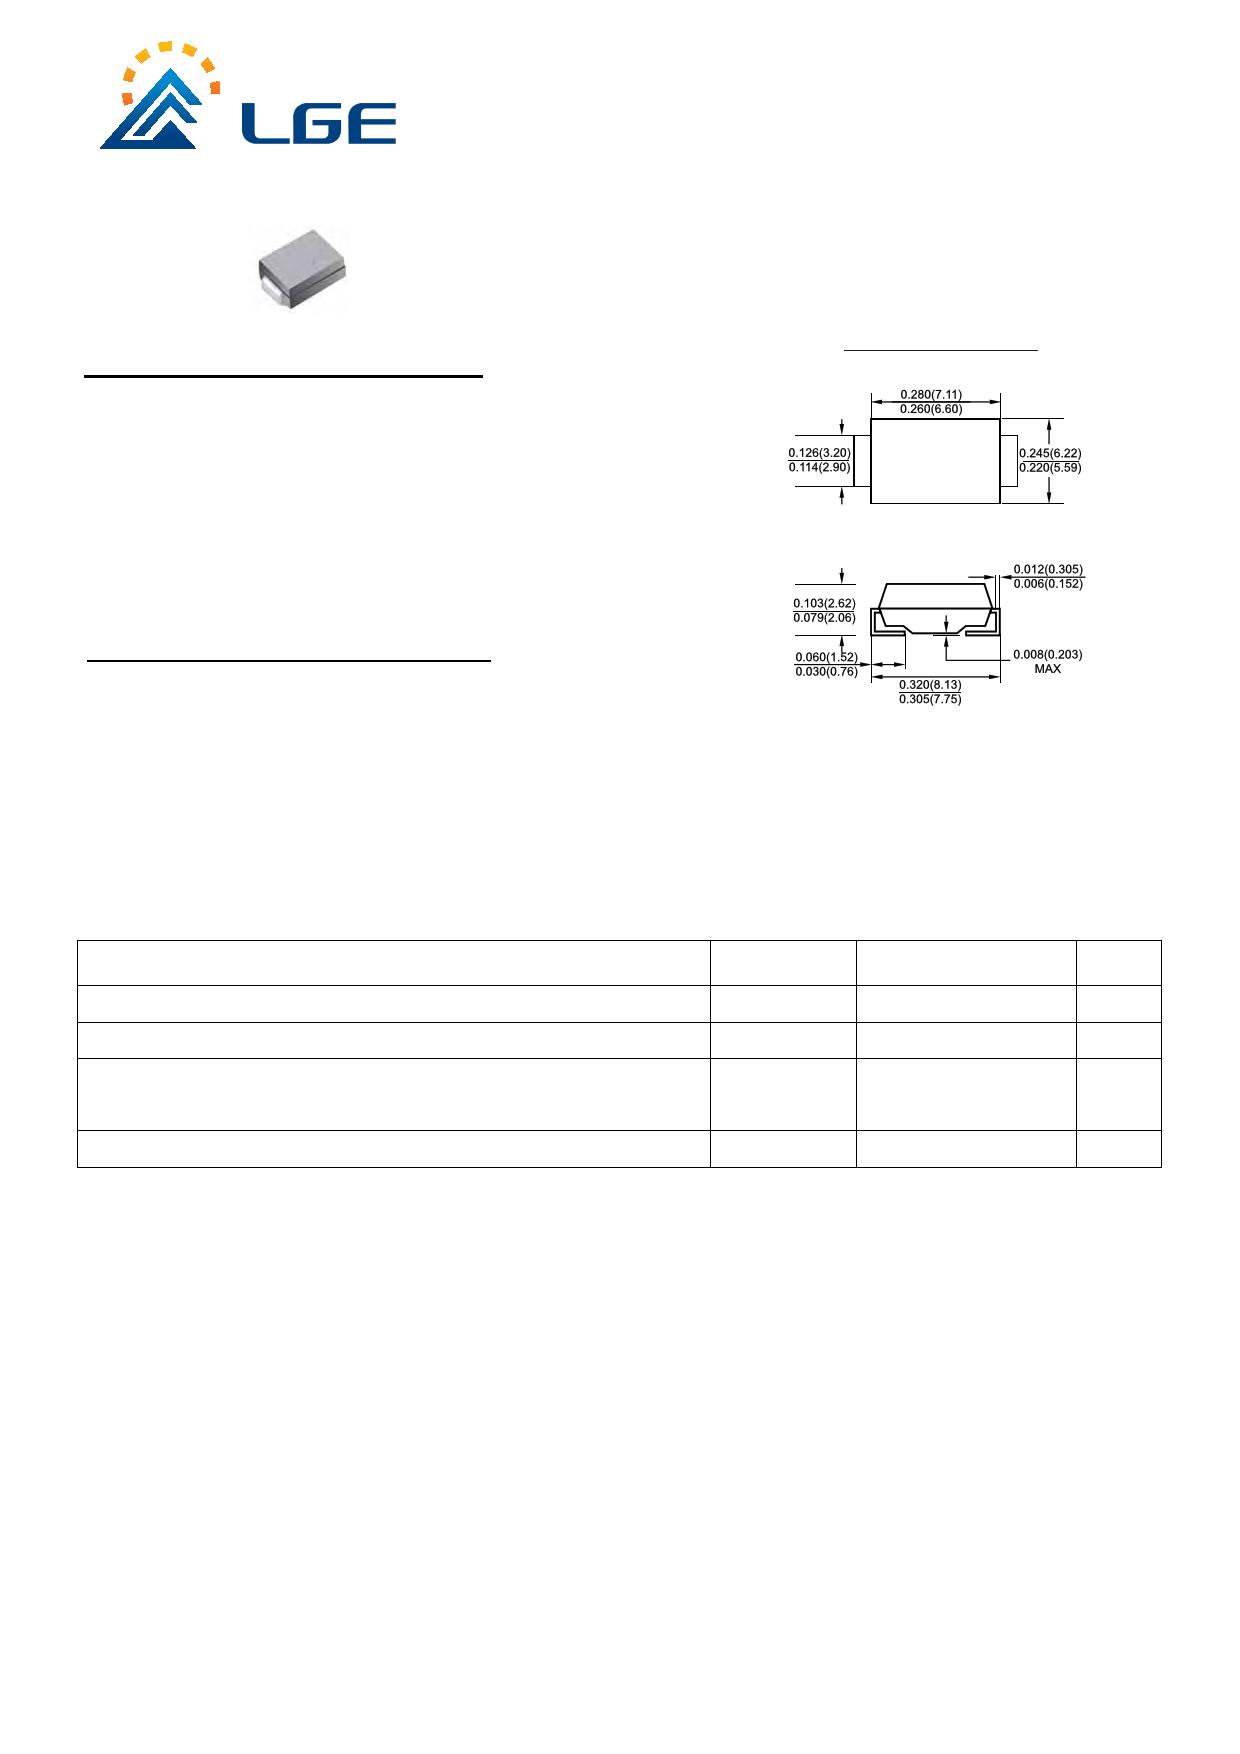 3.0SMCJ120CA Datasheet, 3.0SMCJ120CA PDF,ピン配置, 機能